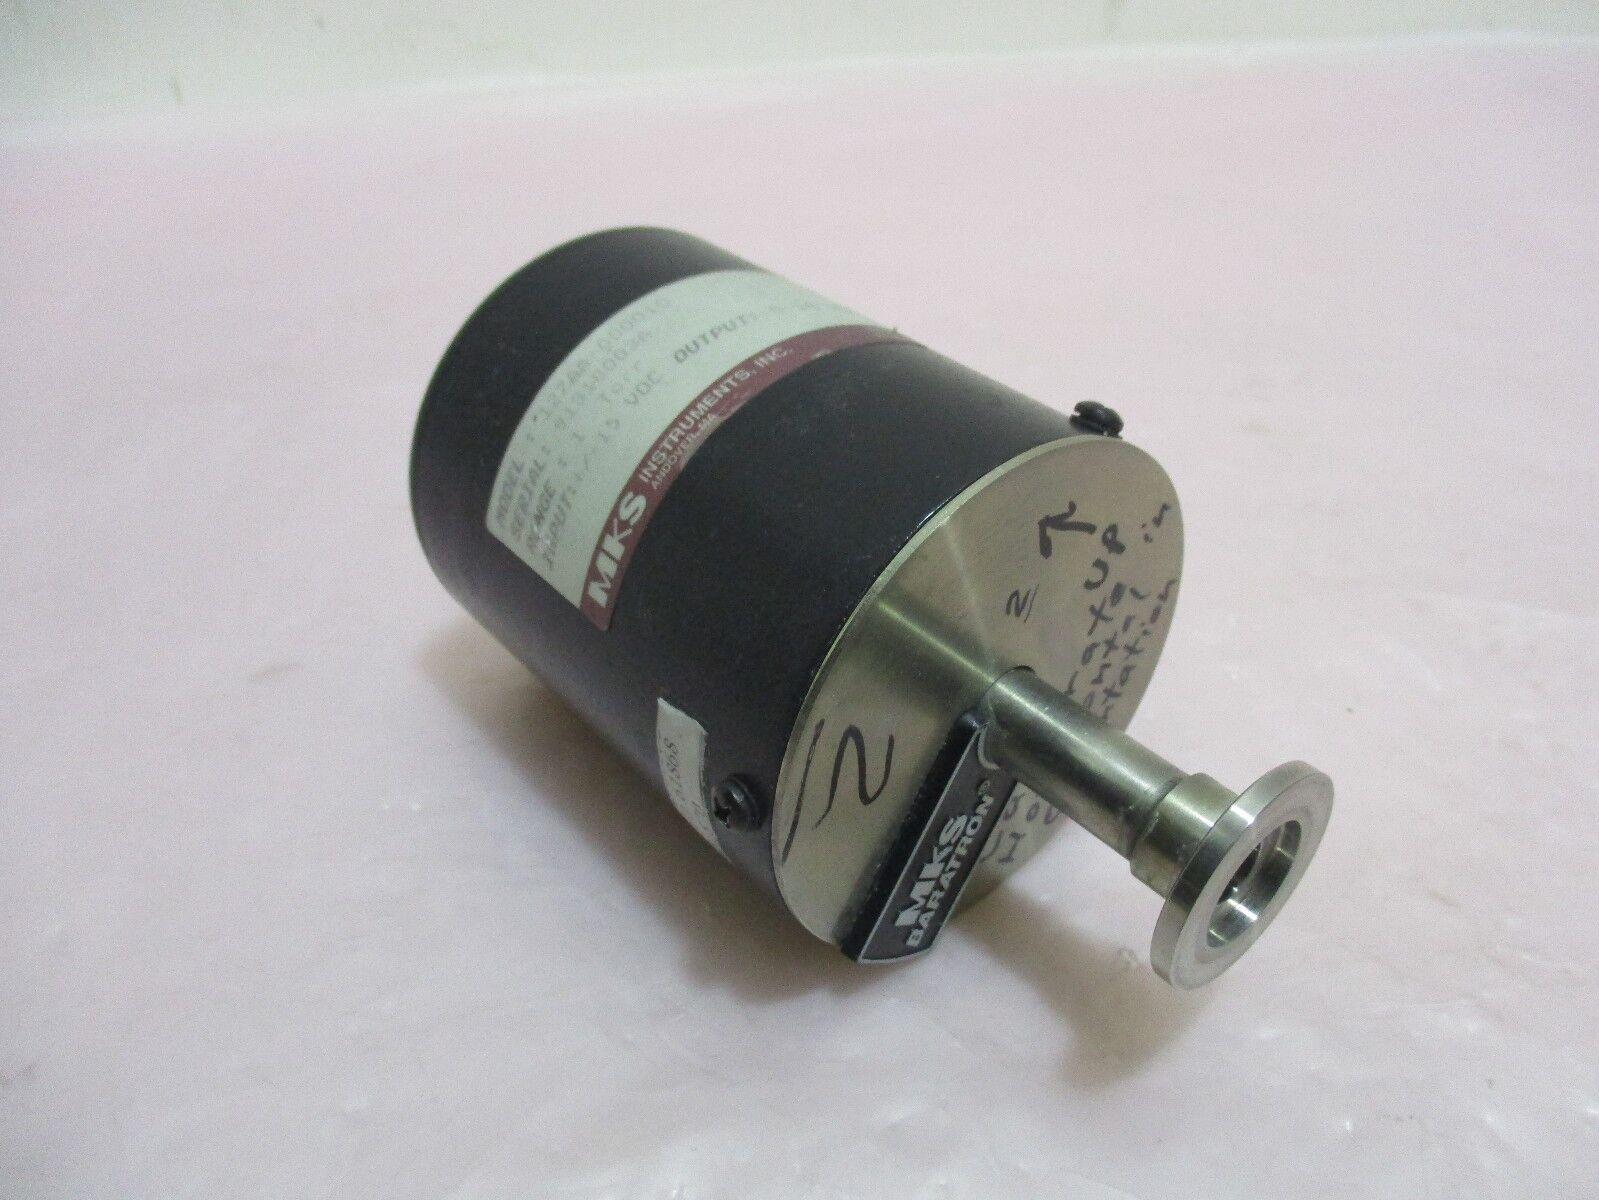 MKS 127AA-00001D, Baratron, Pressure Transducer, 1 Torr, ±15 VDC-250mA. 323974